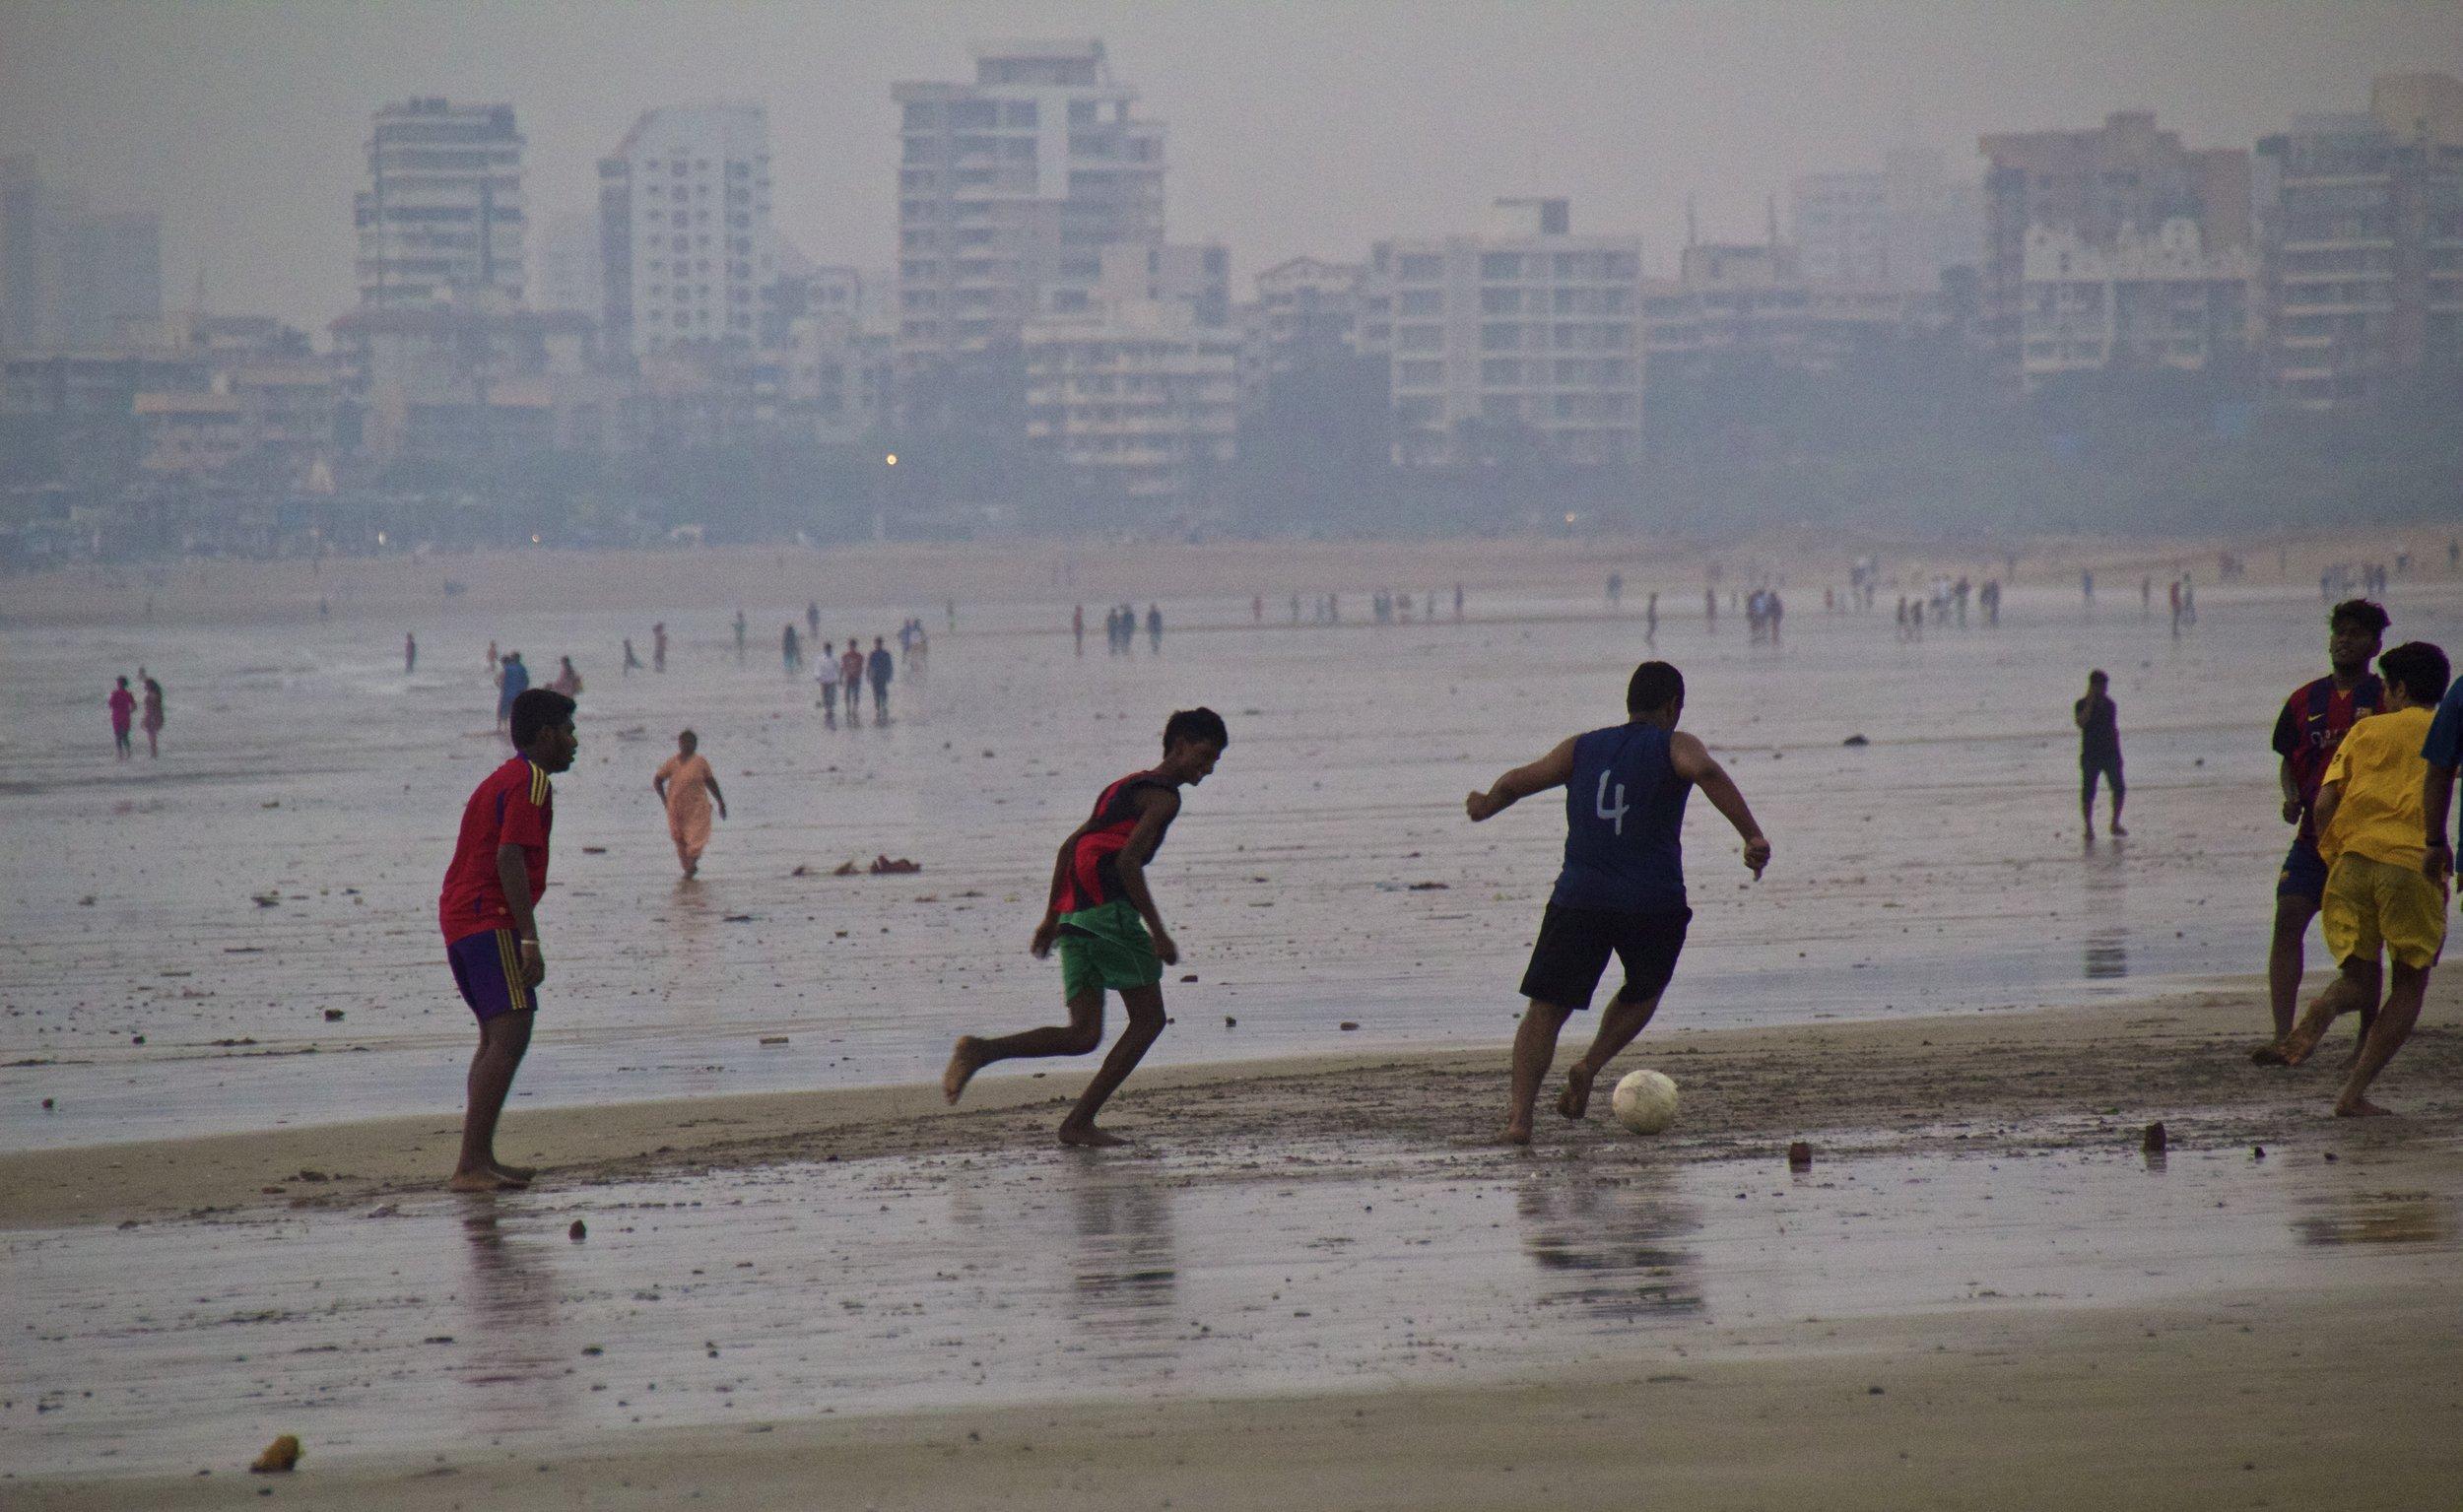 juhu beach mumbai bombay india photography 4.jpg